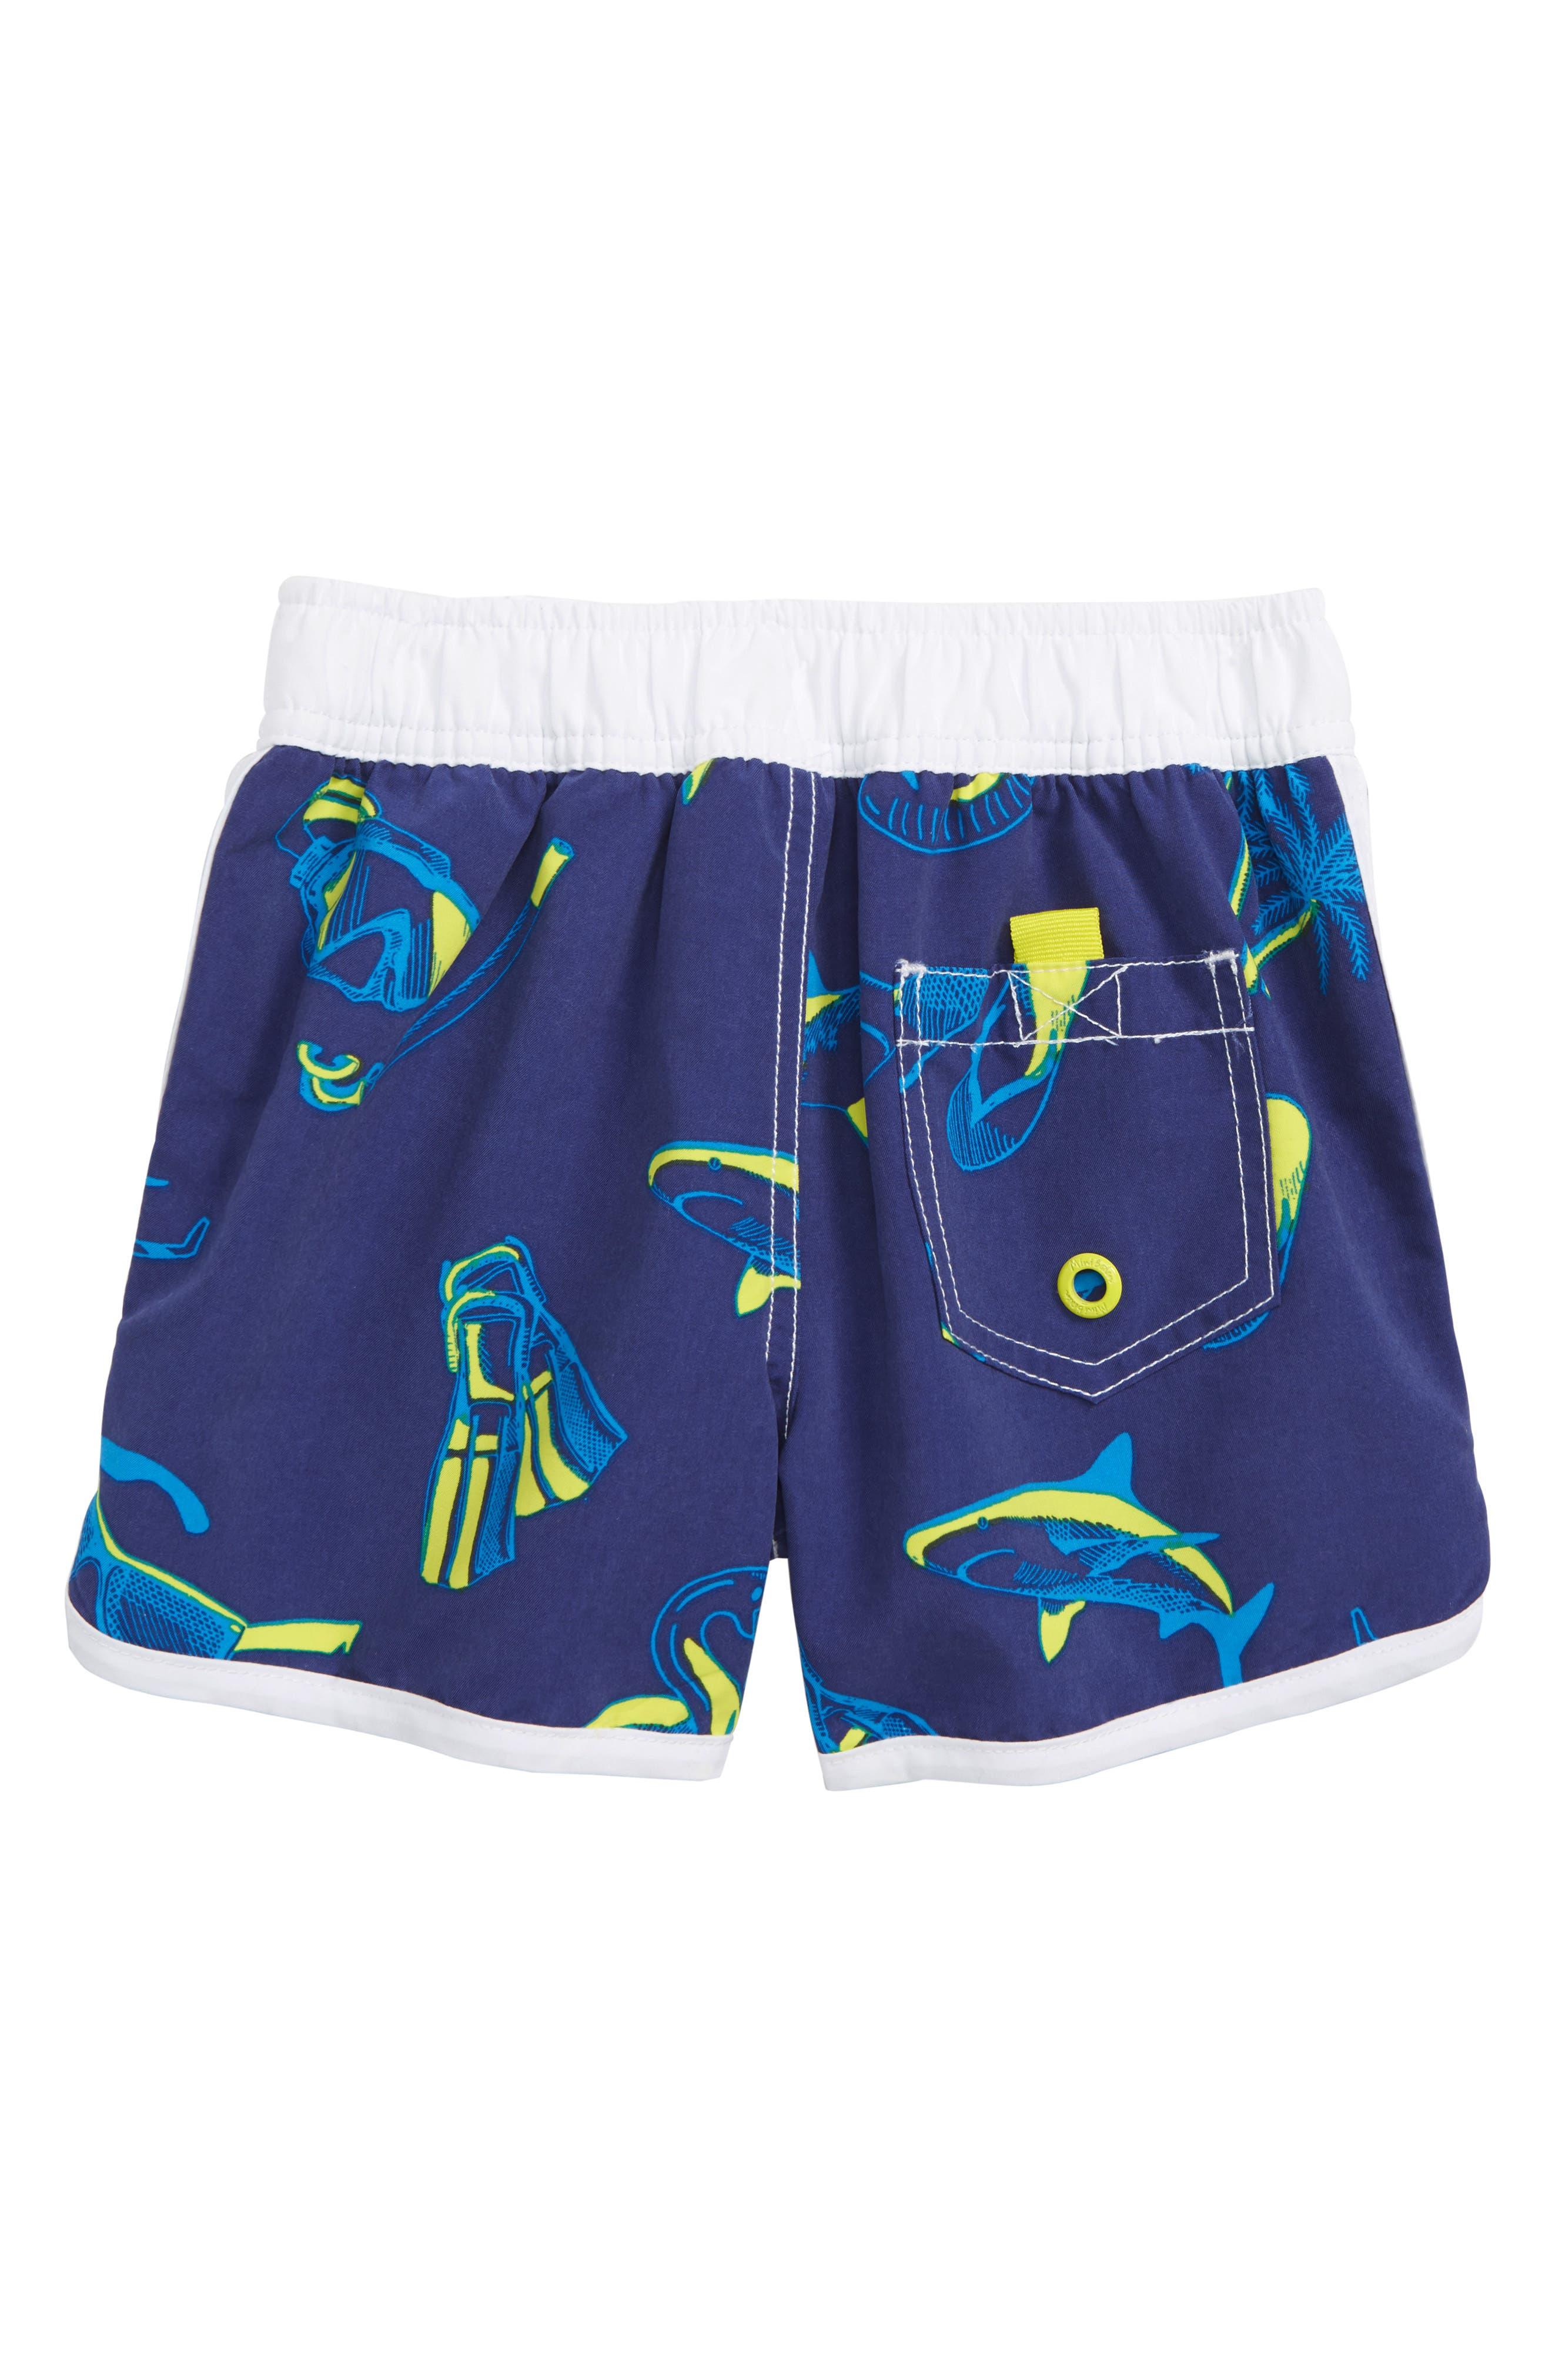 Surf Holiday Swim Trunks,                             Alternate thumbnail 2, color,                             STARBOARD BLUE